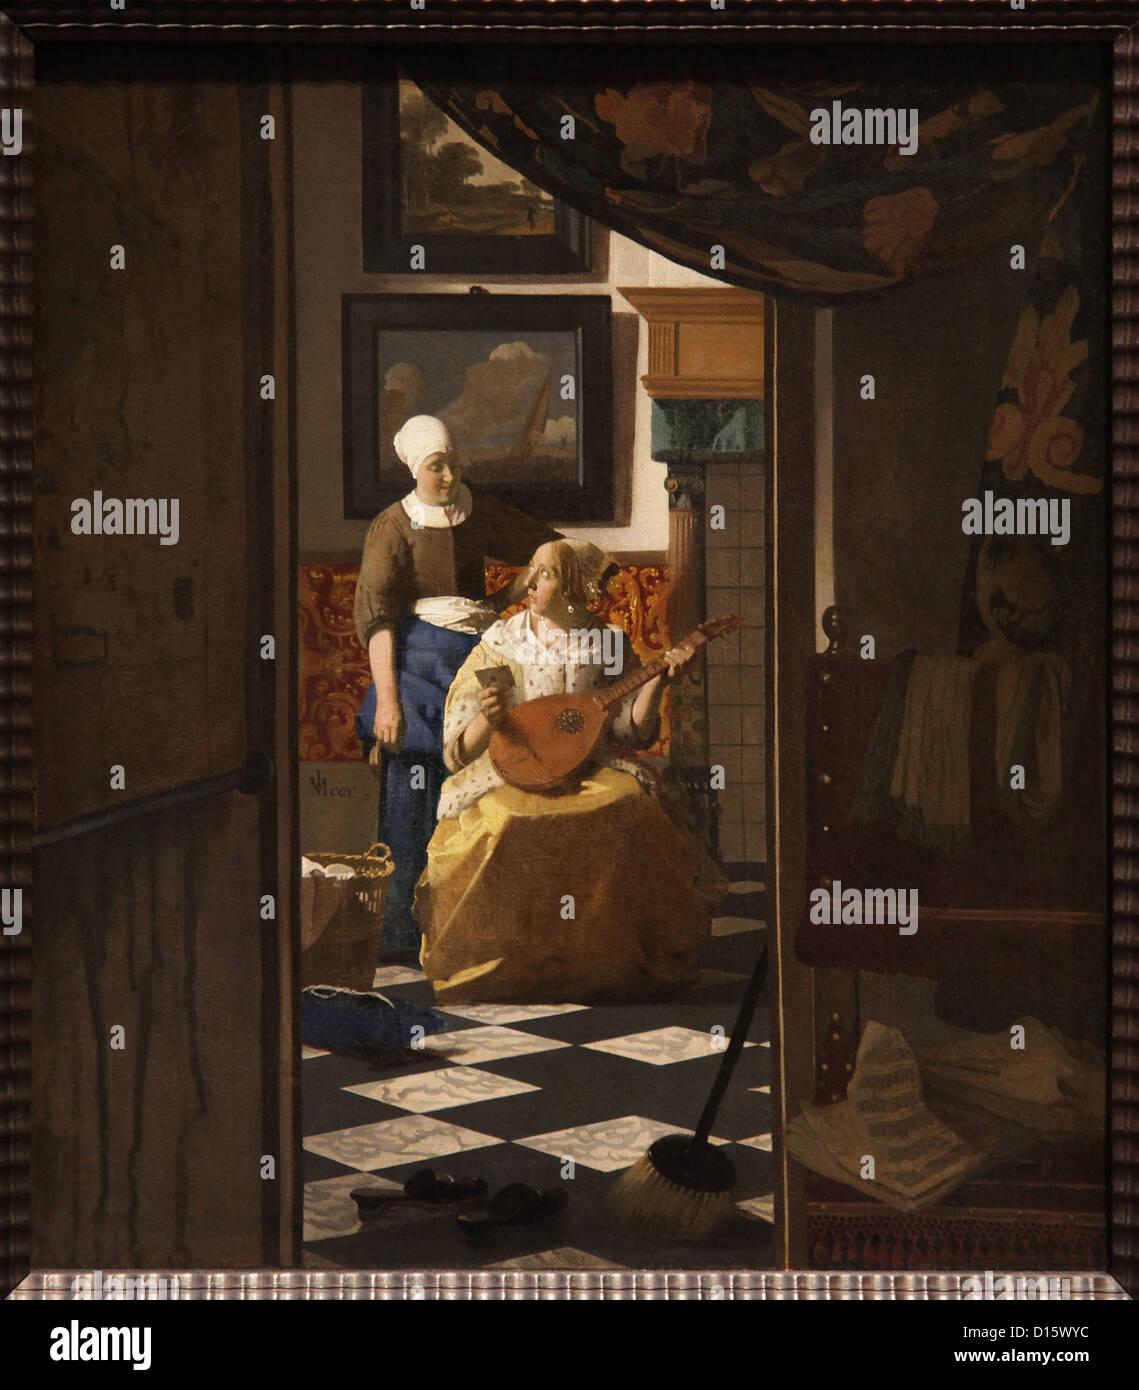 Johannes Vermeer,the love letter,1669,oil on canvas,Amsterdam Holland. - Stock Image